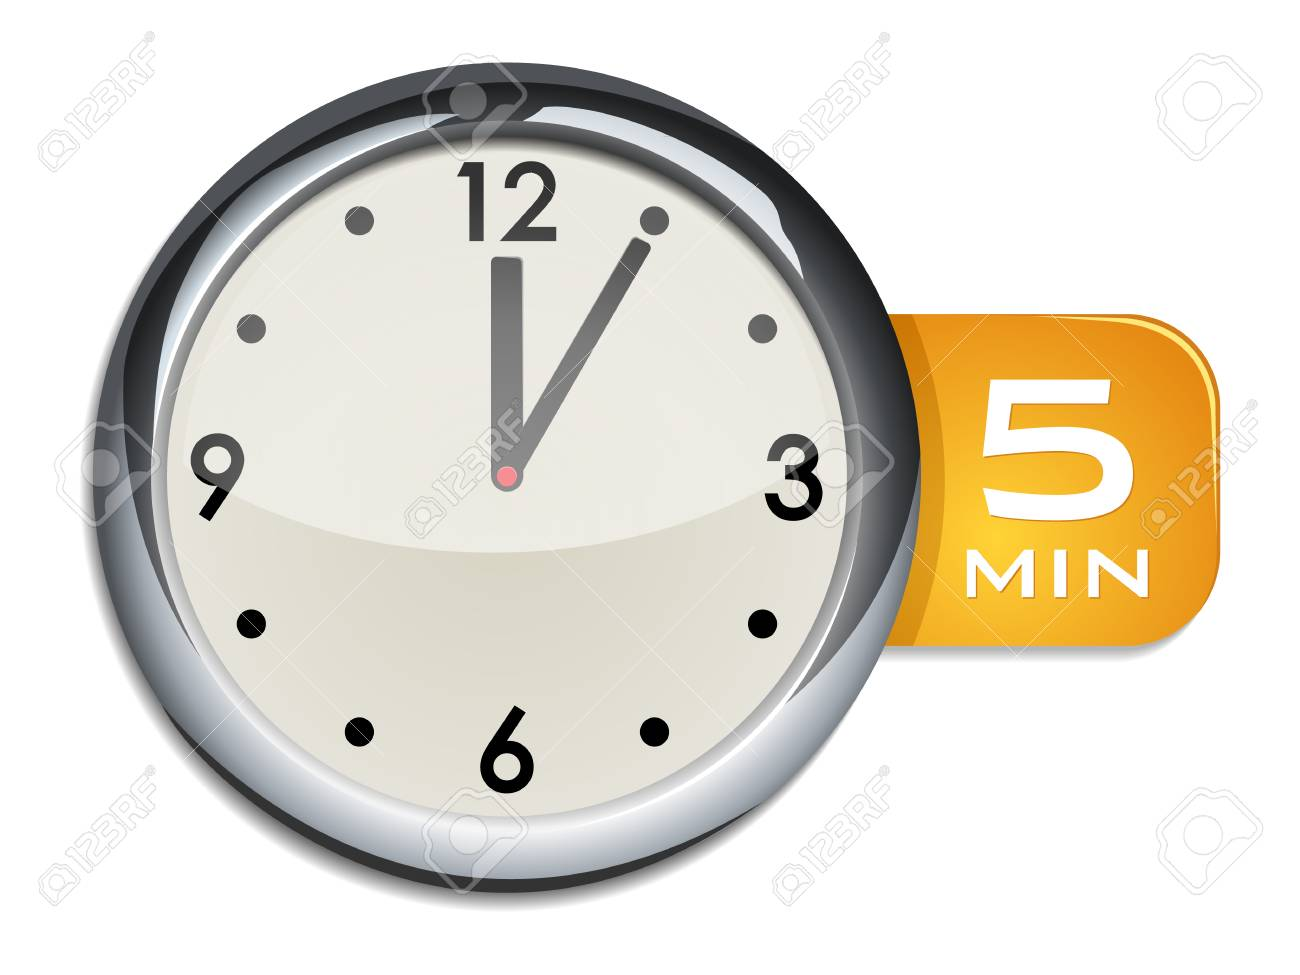 office wall clock timer 5 minutes royalty free cliparts vectors